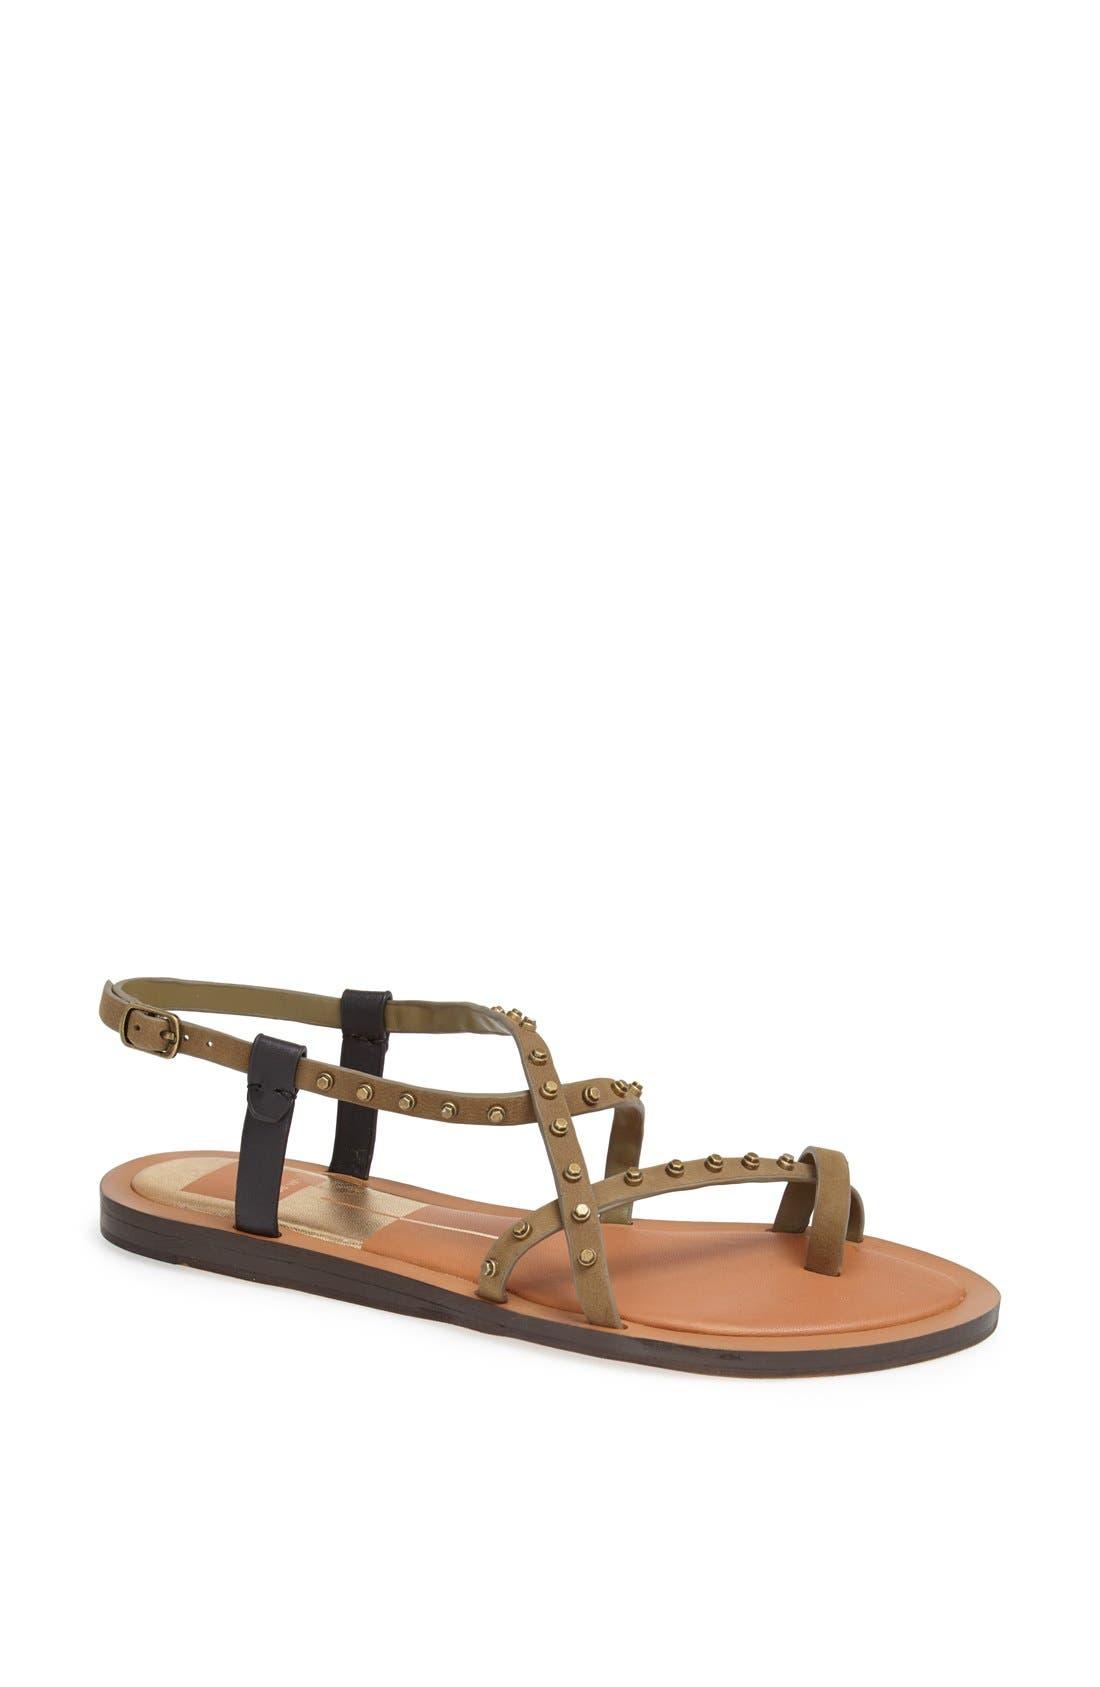 Main Image - Dolce Vita 'Flame' Studded Leather Sandal